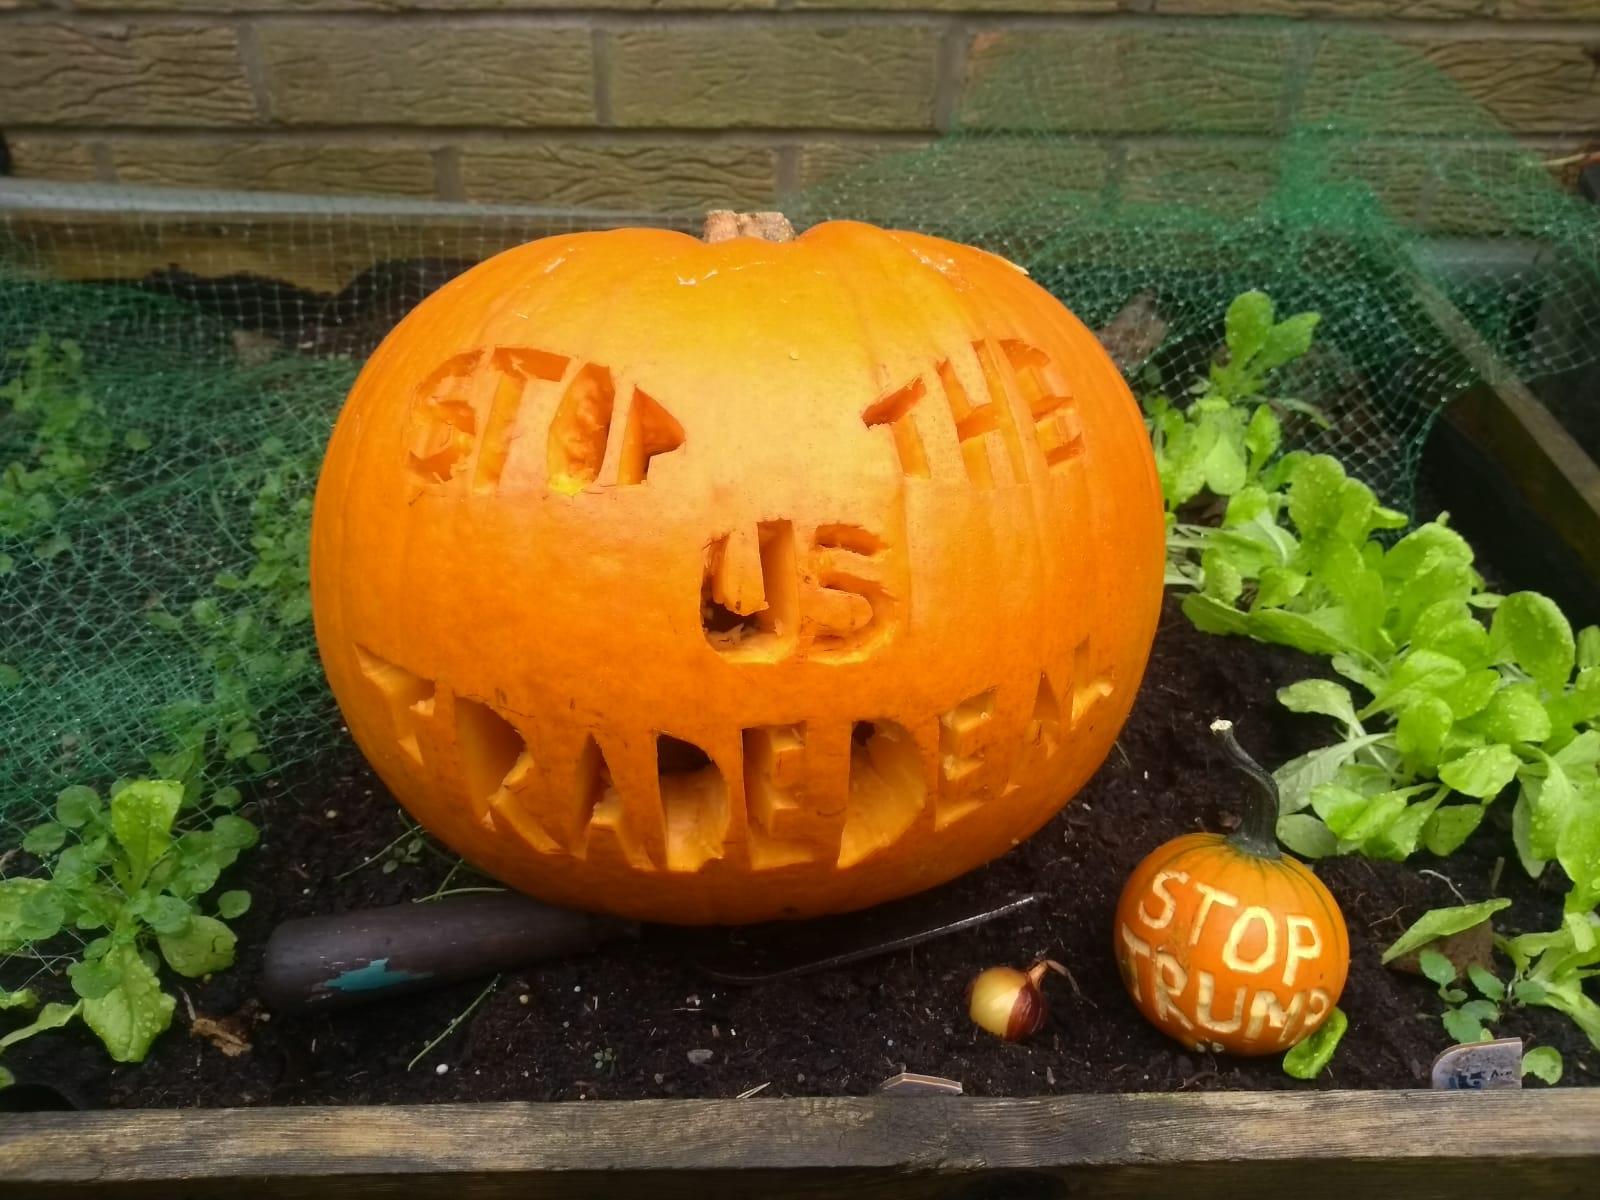 Stop the US Trade Deal pumpkin!